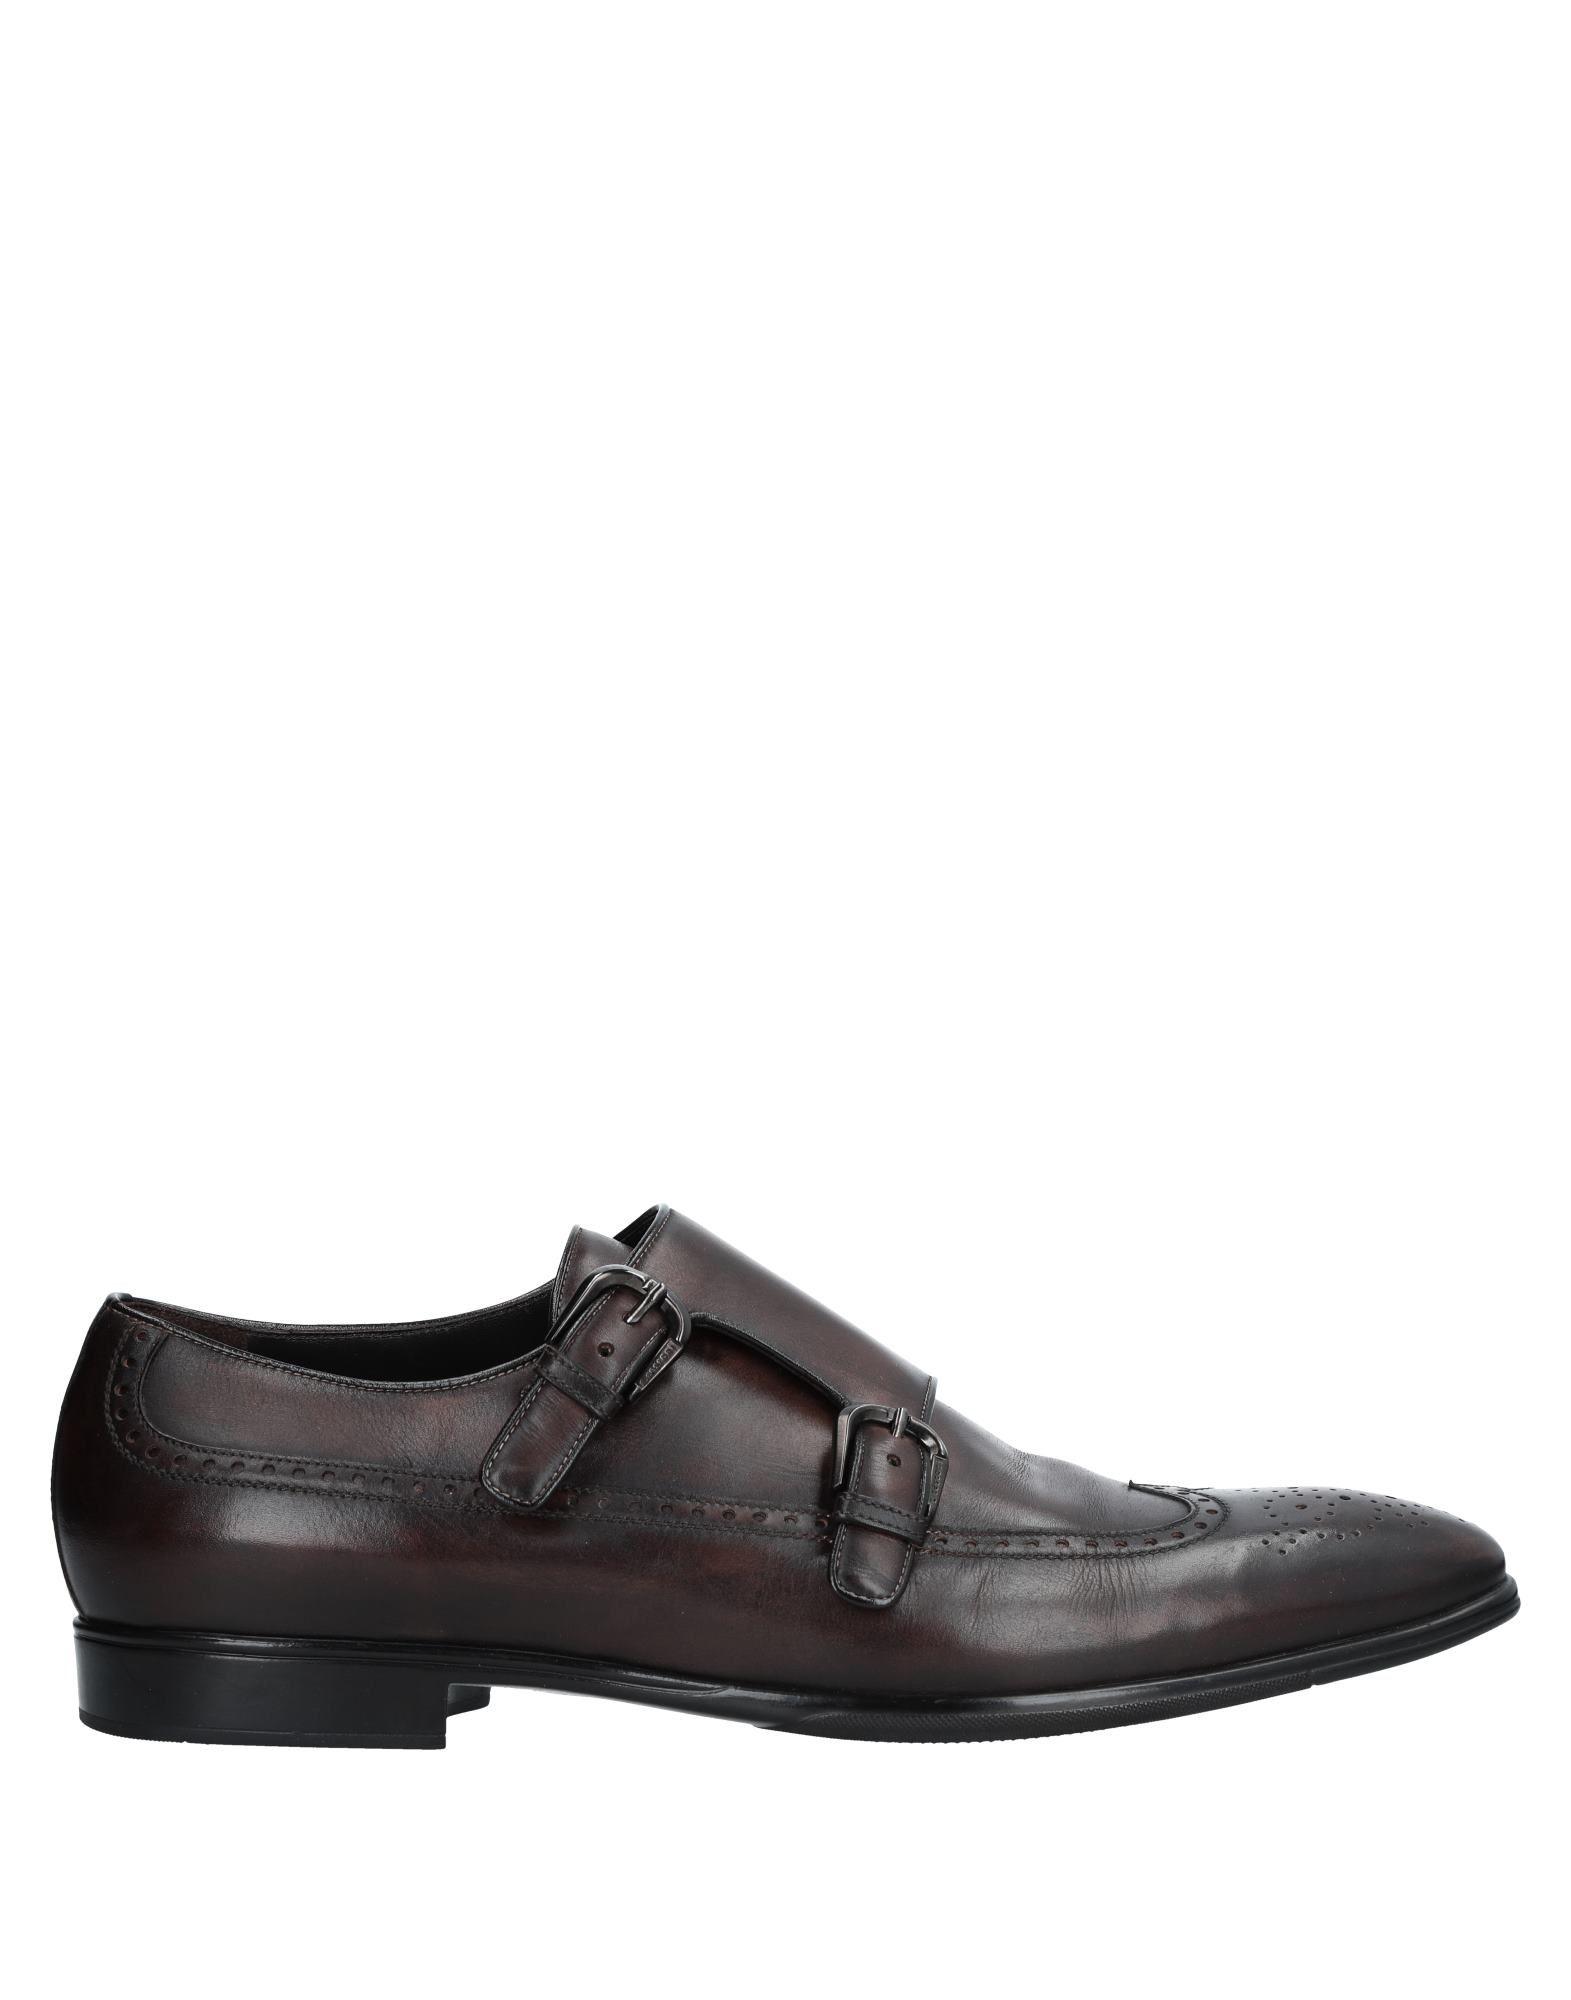 A.Testoni Mokassins Herren  11253035VS Gute Qualität beliebte Schuhe